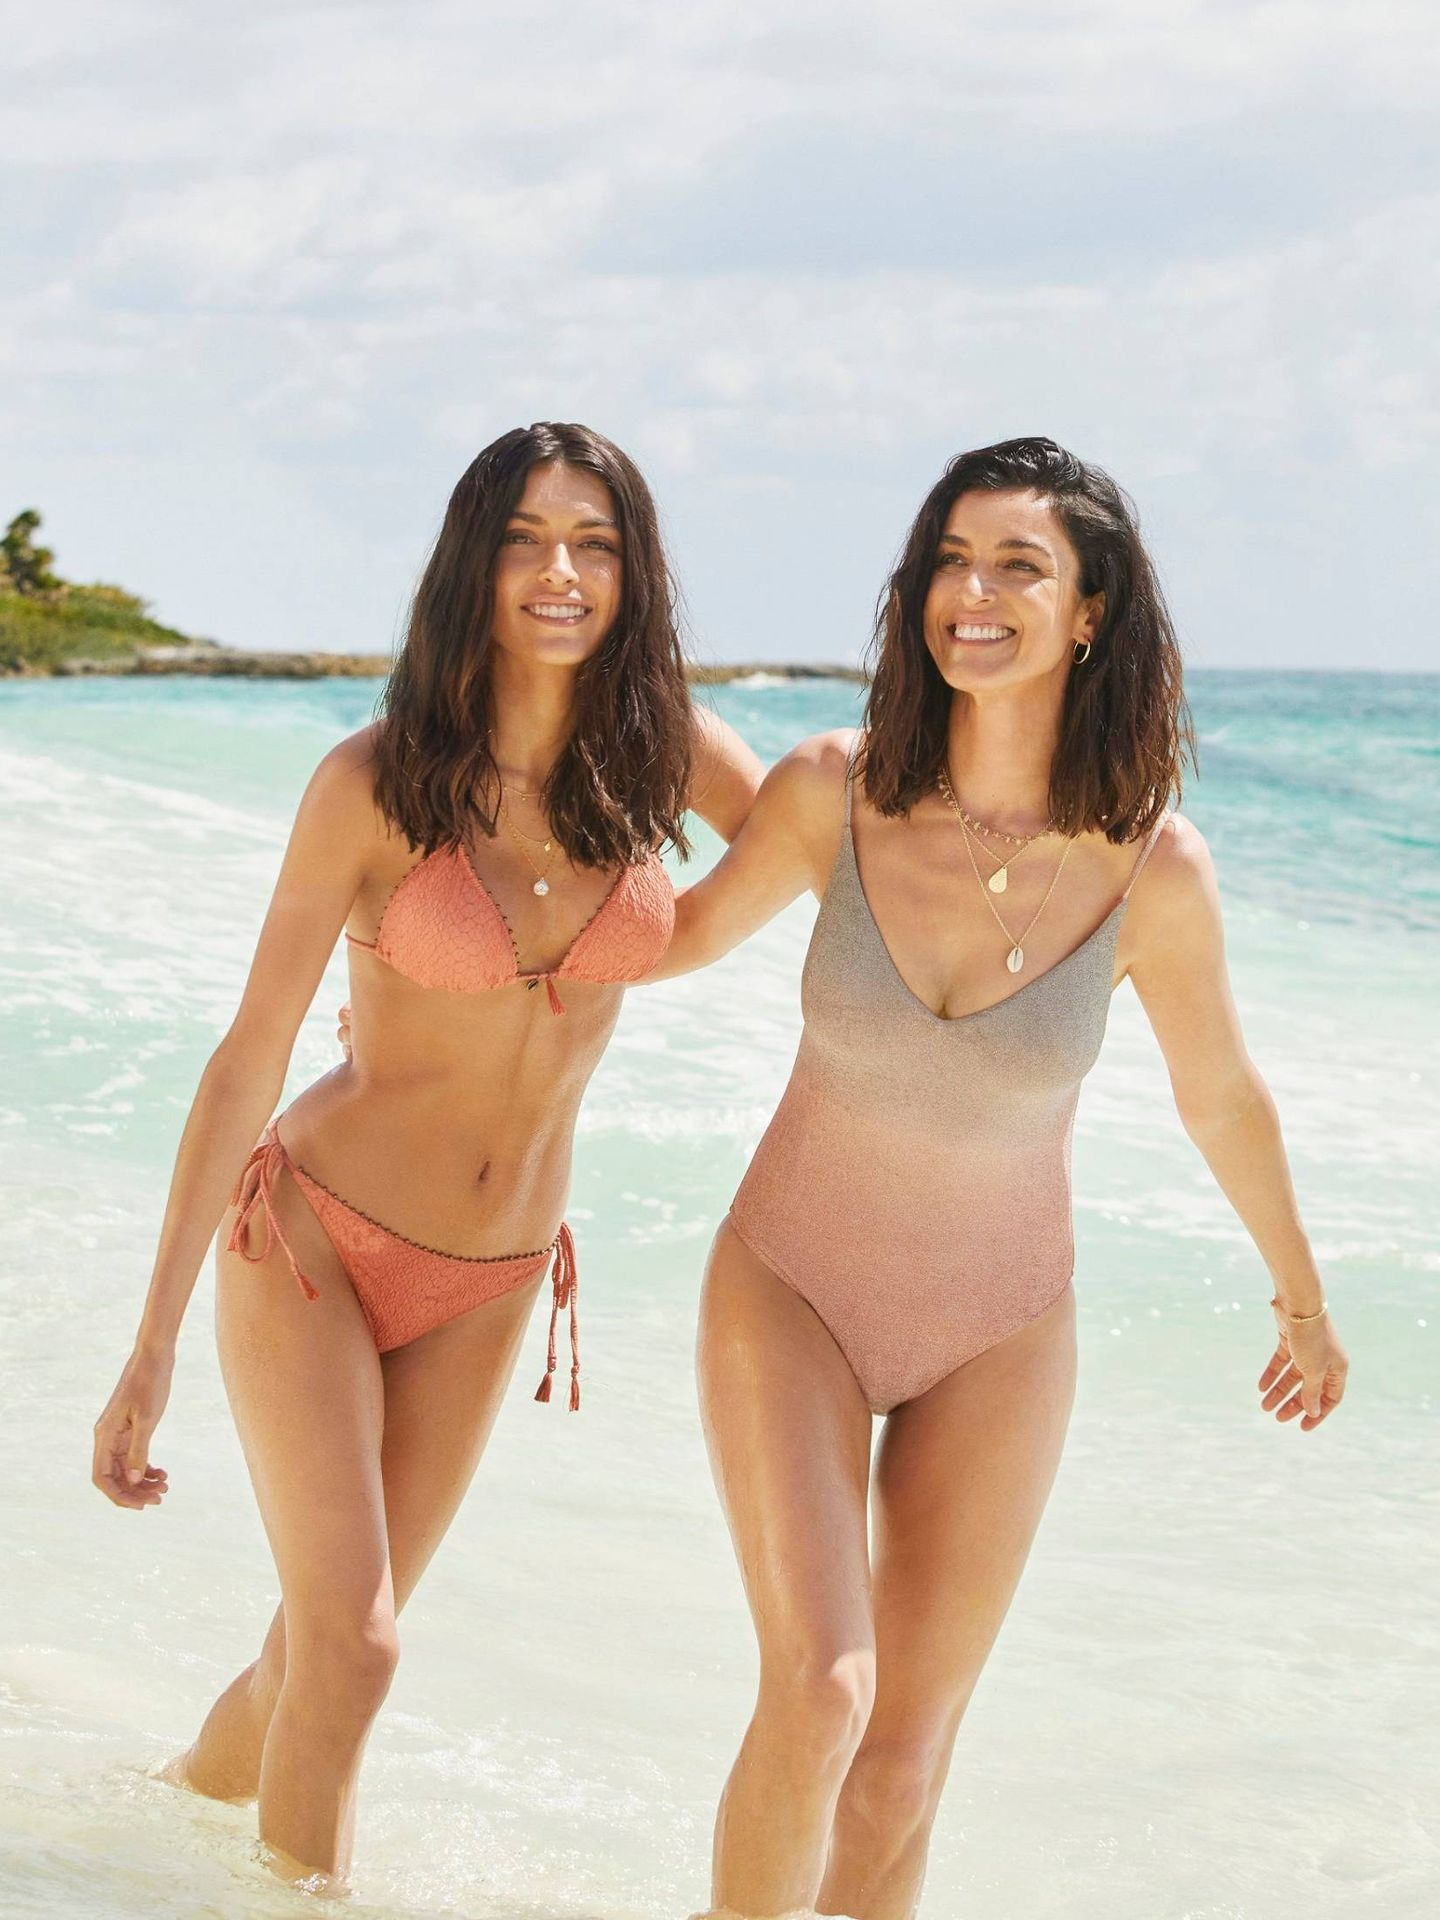 Lucía Rivero y Blanca Romero para Women'secret. (Imagen: Laia Benavides)